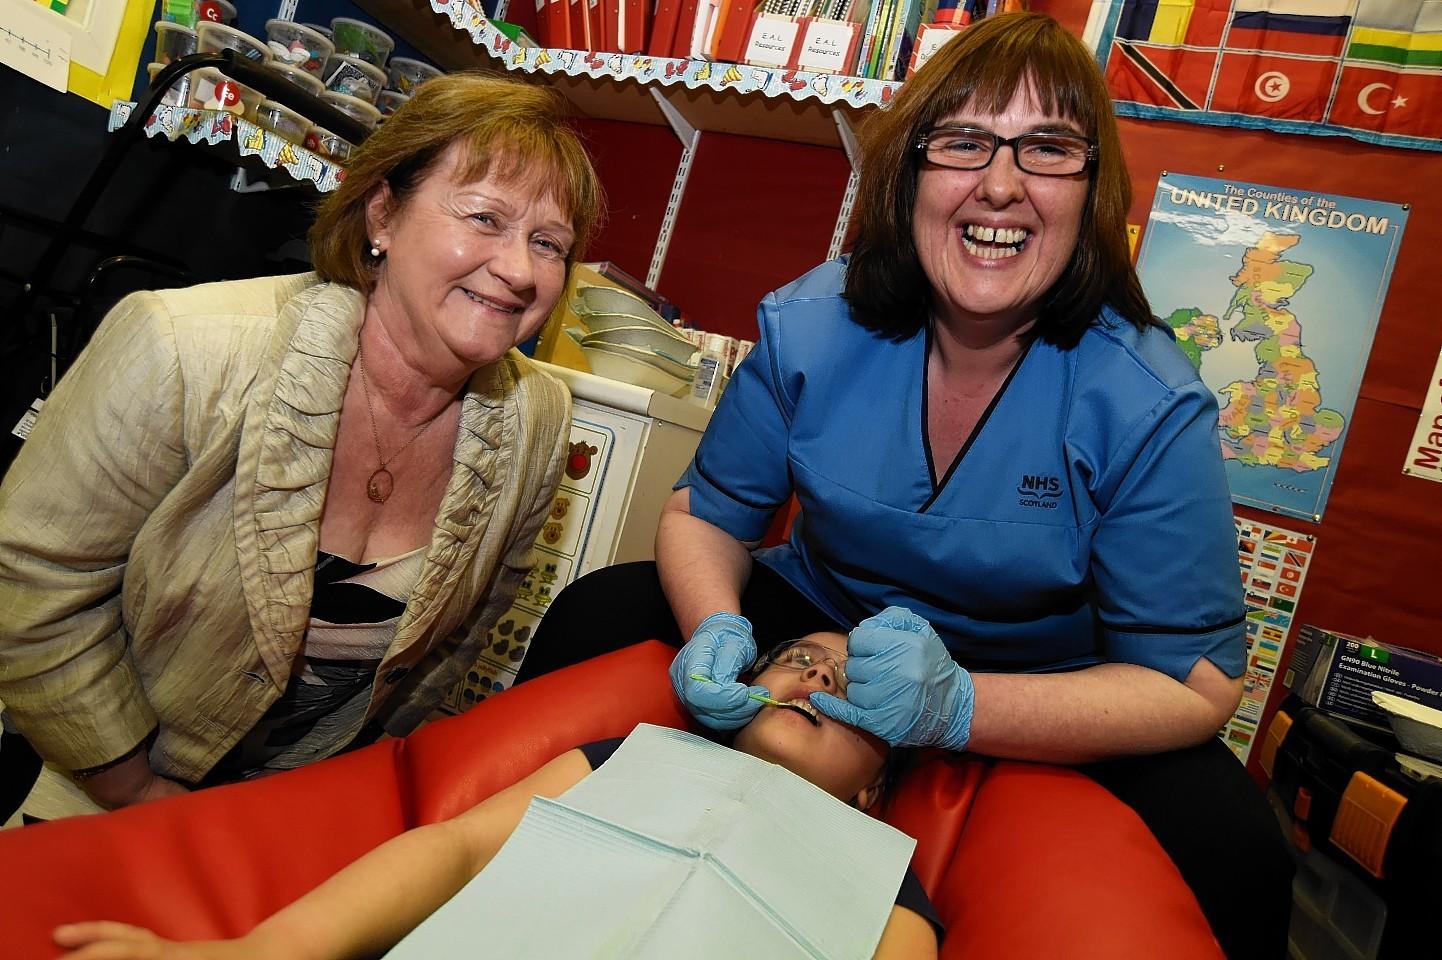 Public health minister Maureen Watt, dental nurse Paula Buchan and Peterhead Central School  Nursery pupil Sophia McAllister